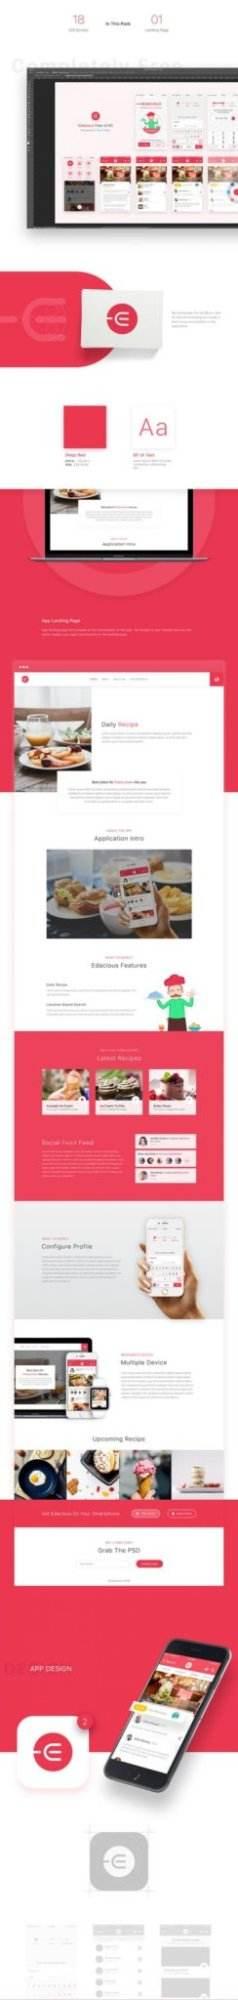 edacious free ui kit full preview